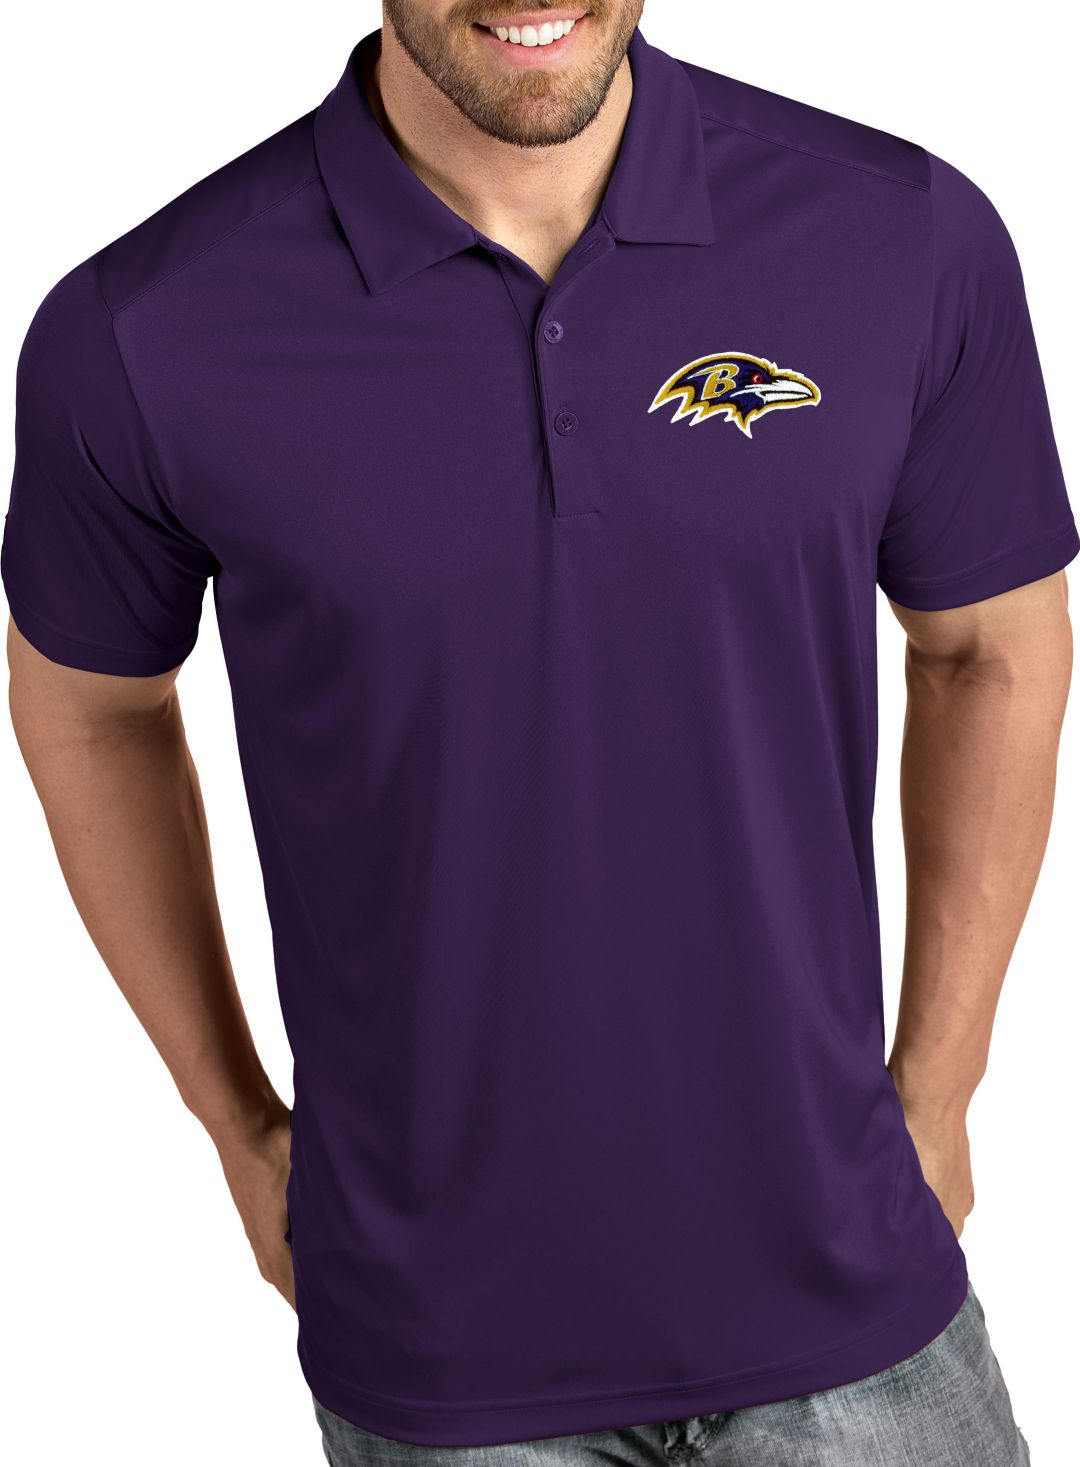 7275d8e6 Antigua Men's Baltimore Ravens Tribute Purple Polo